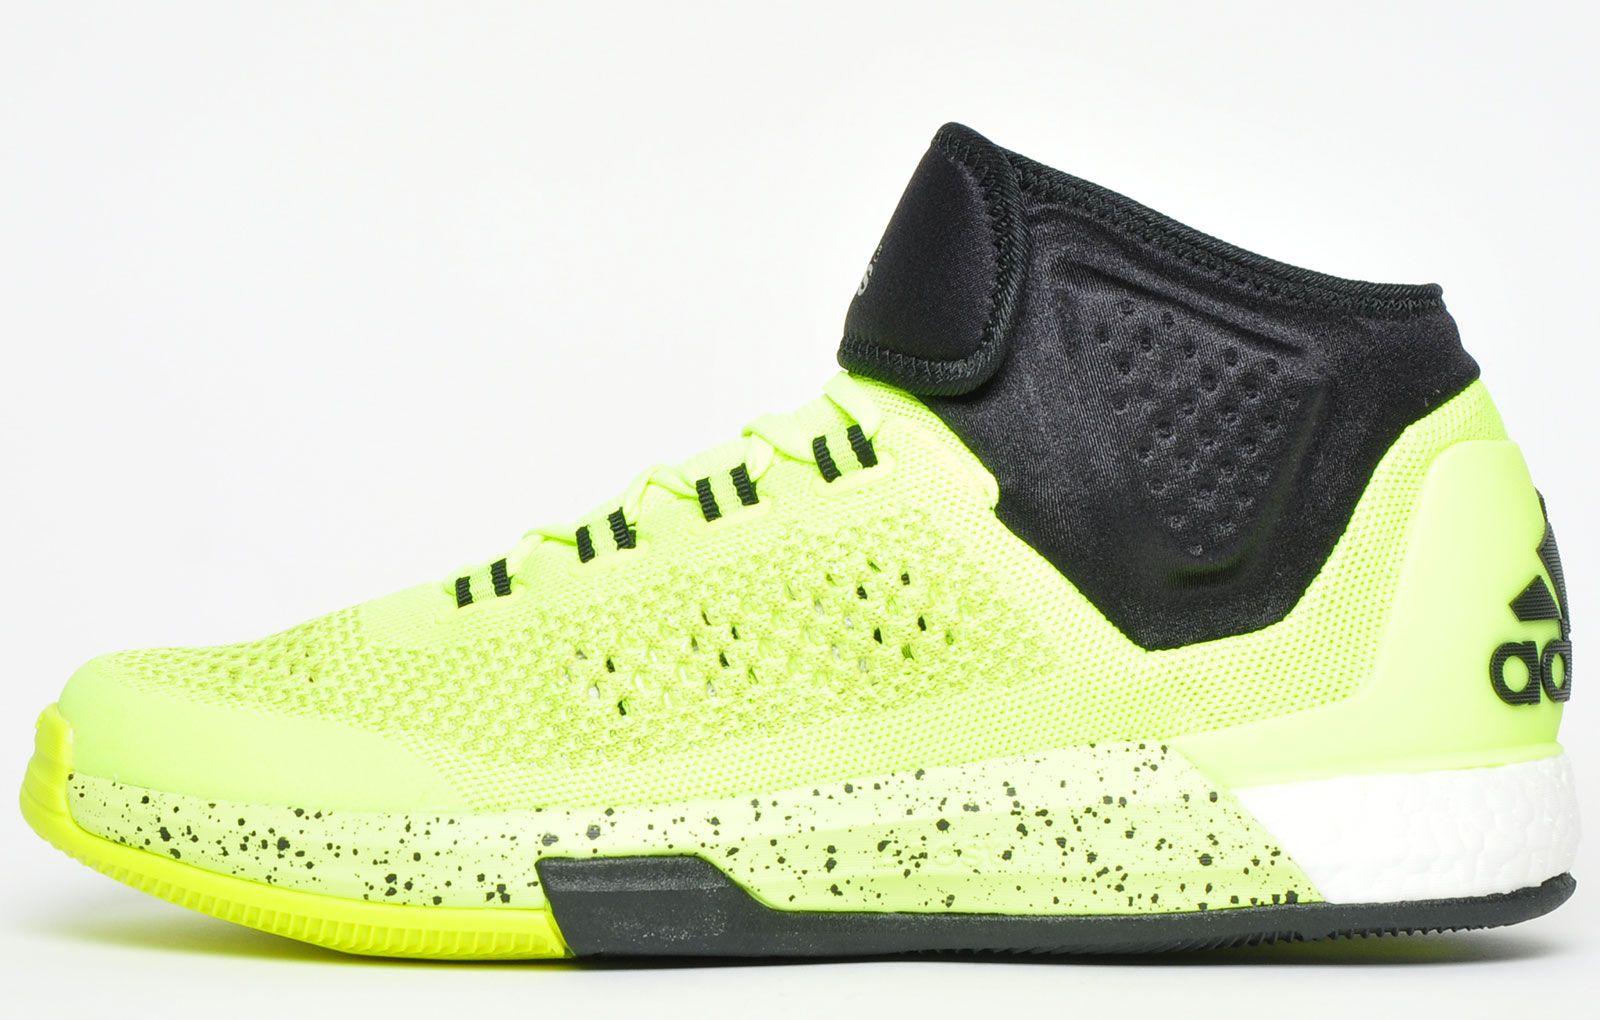 Adidas Crazylight Boost Primeknit Mens